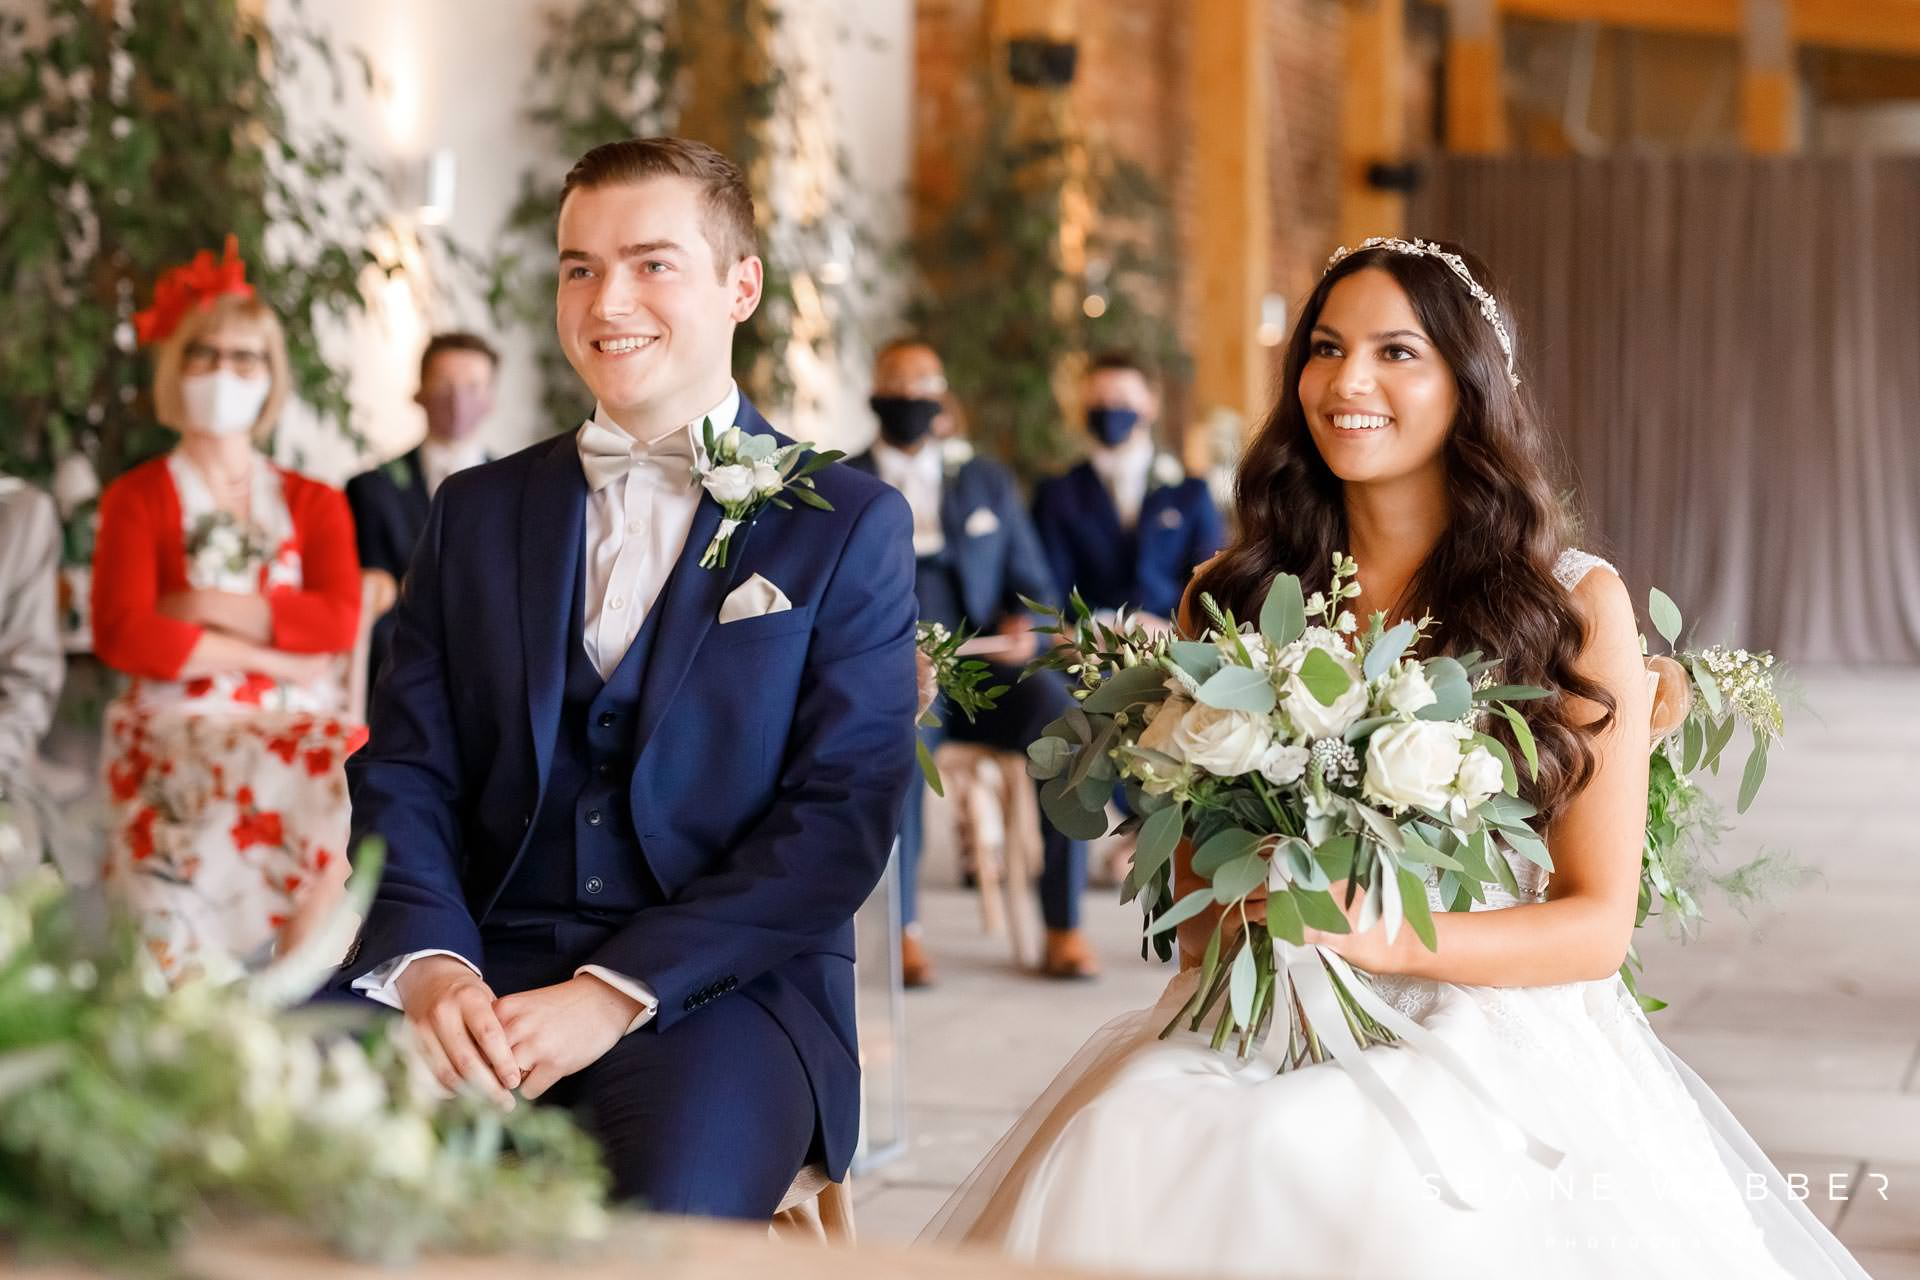 Wedding ceremony photography at Thorpe Gardens